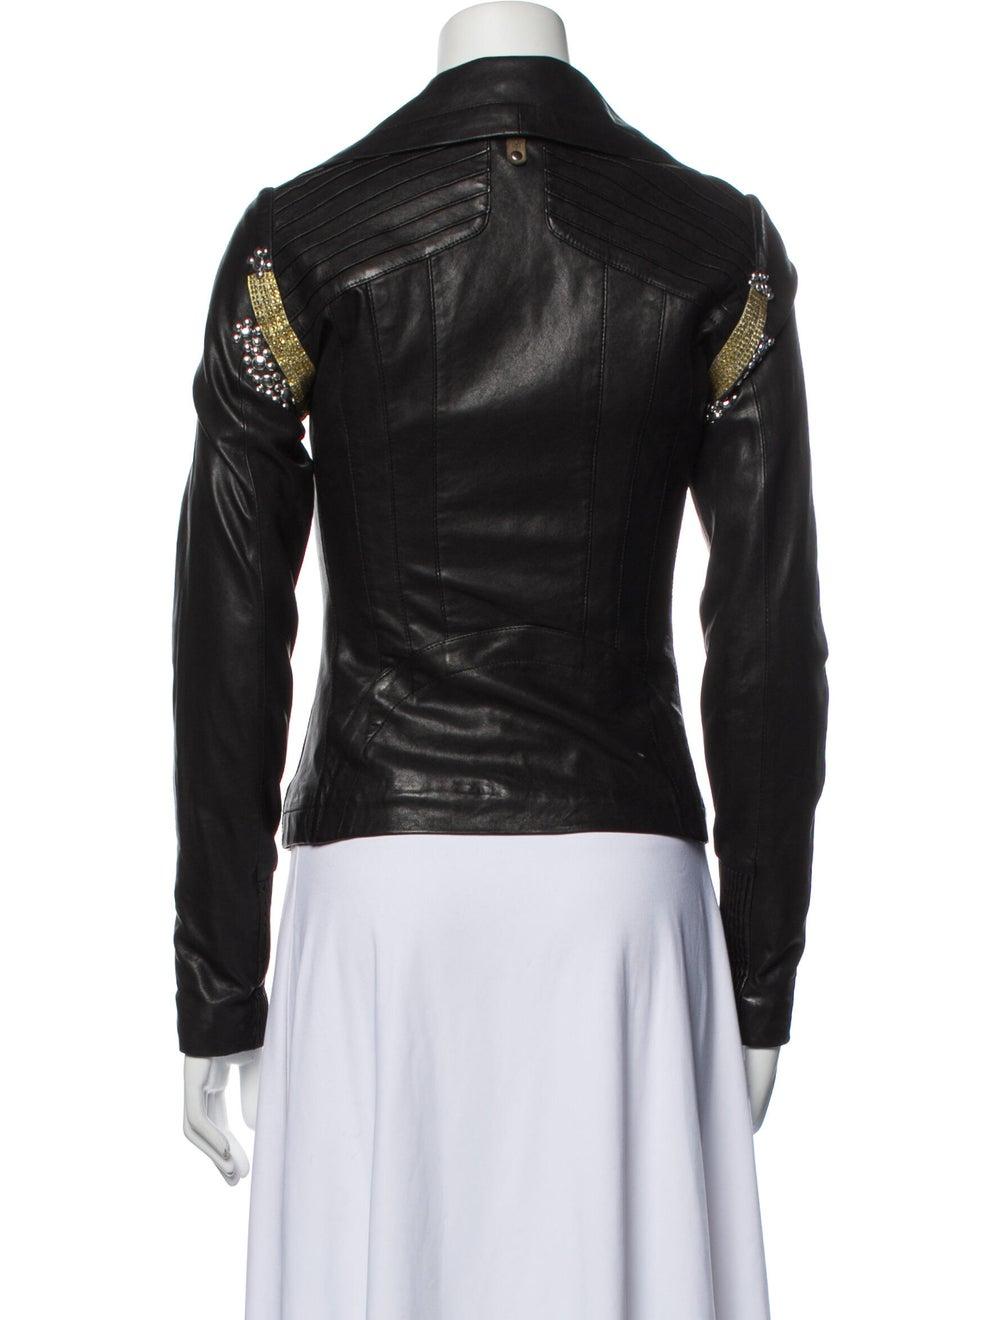 Mackage Biker Jacket Black - image 3